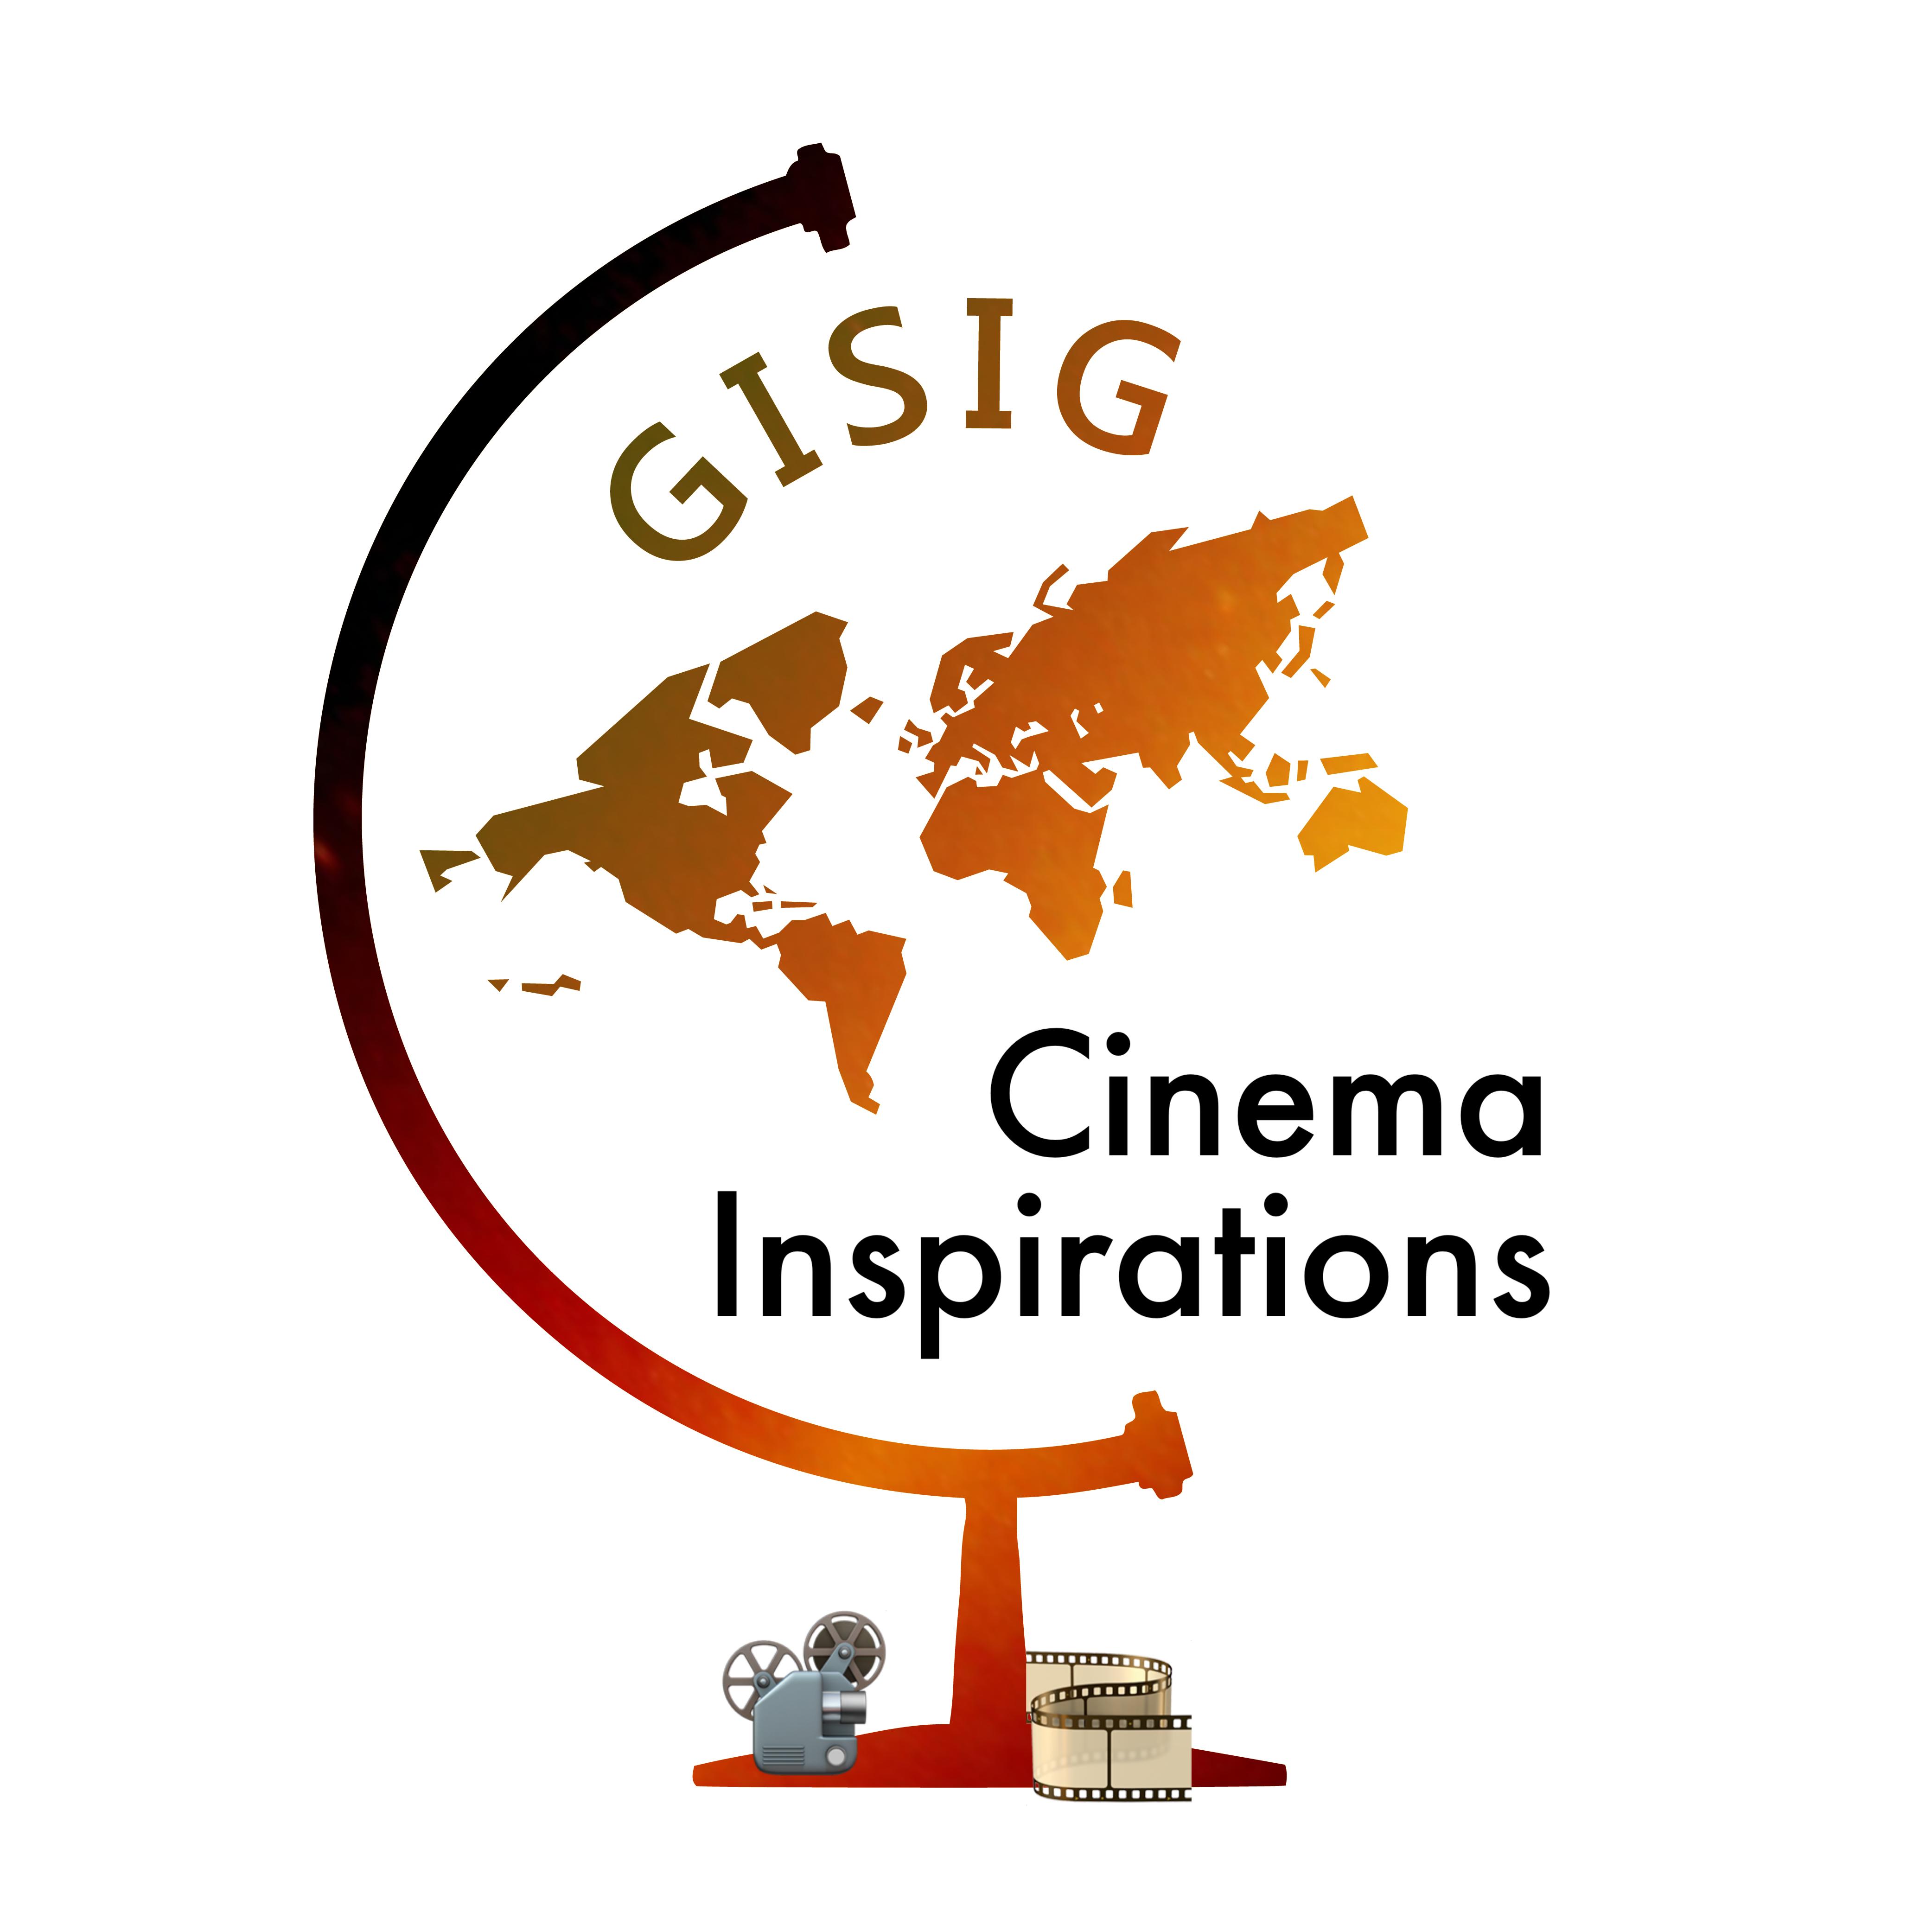 Introducing GISIG Cinema Inspirations